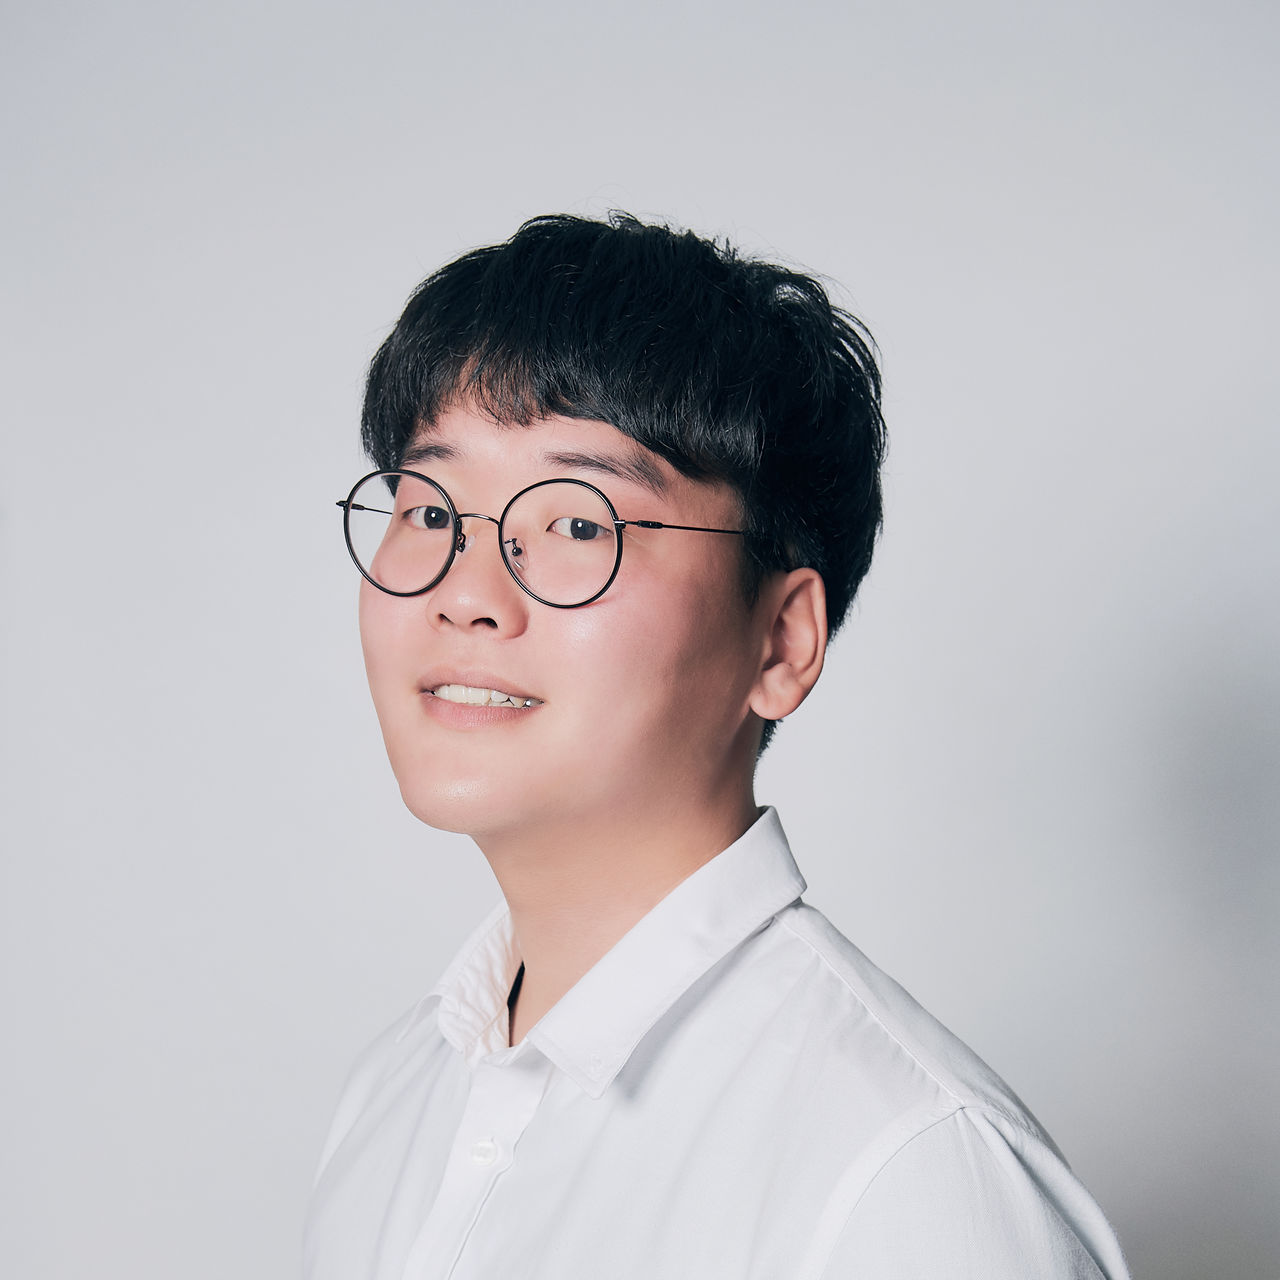 <b>Jung Dae Hyun</b><br>Field Supervisor<br>